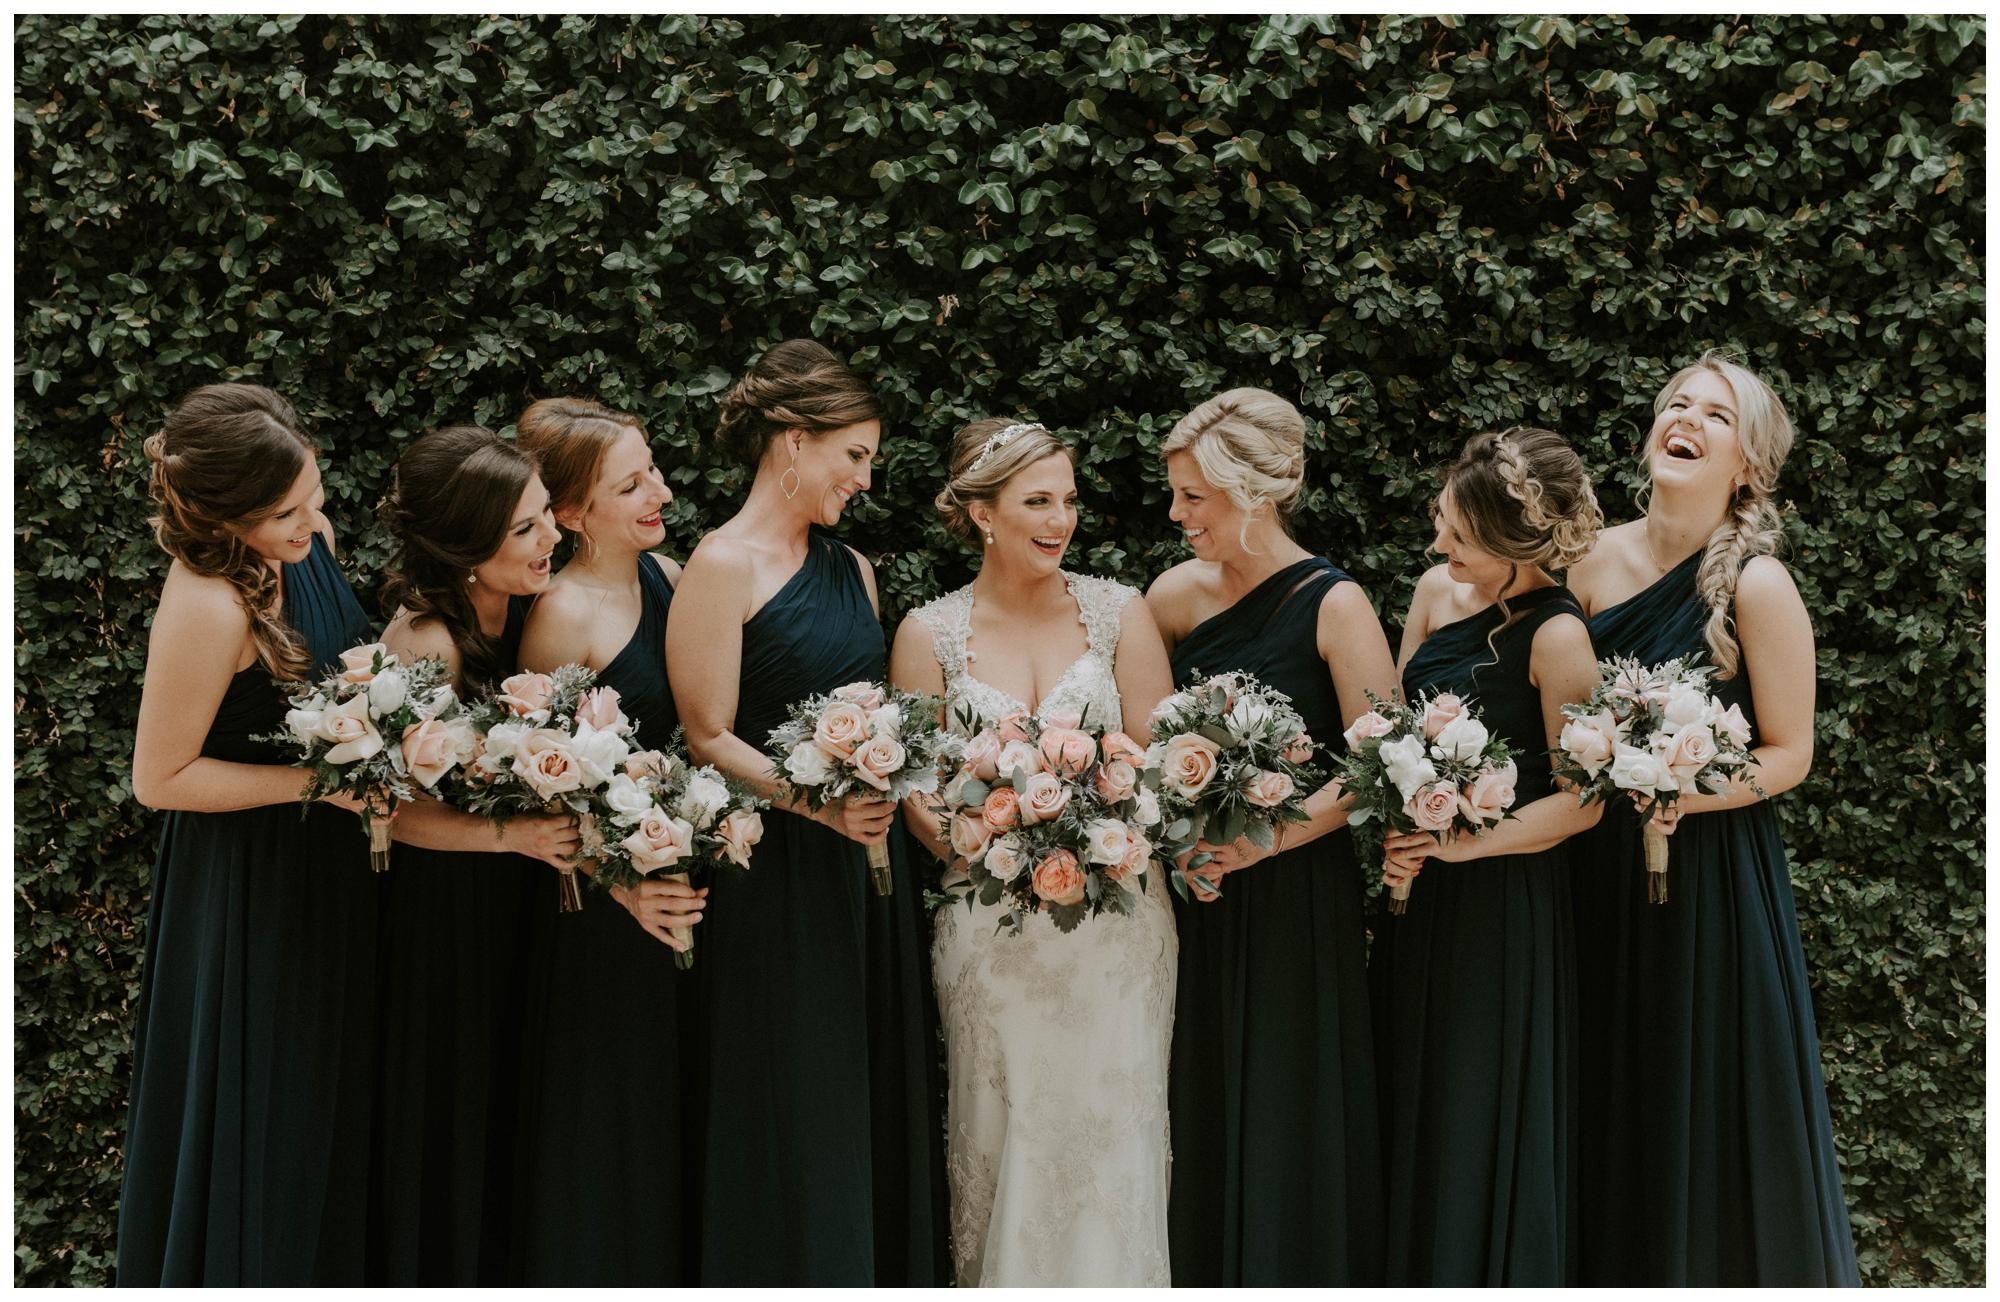 austin-texas-wedding-photography-1778-photographie_0038.jpg